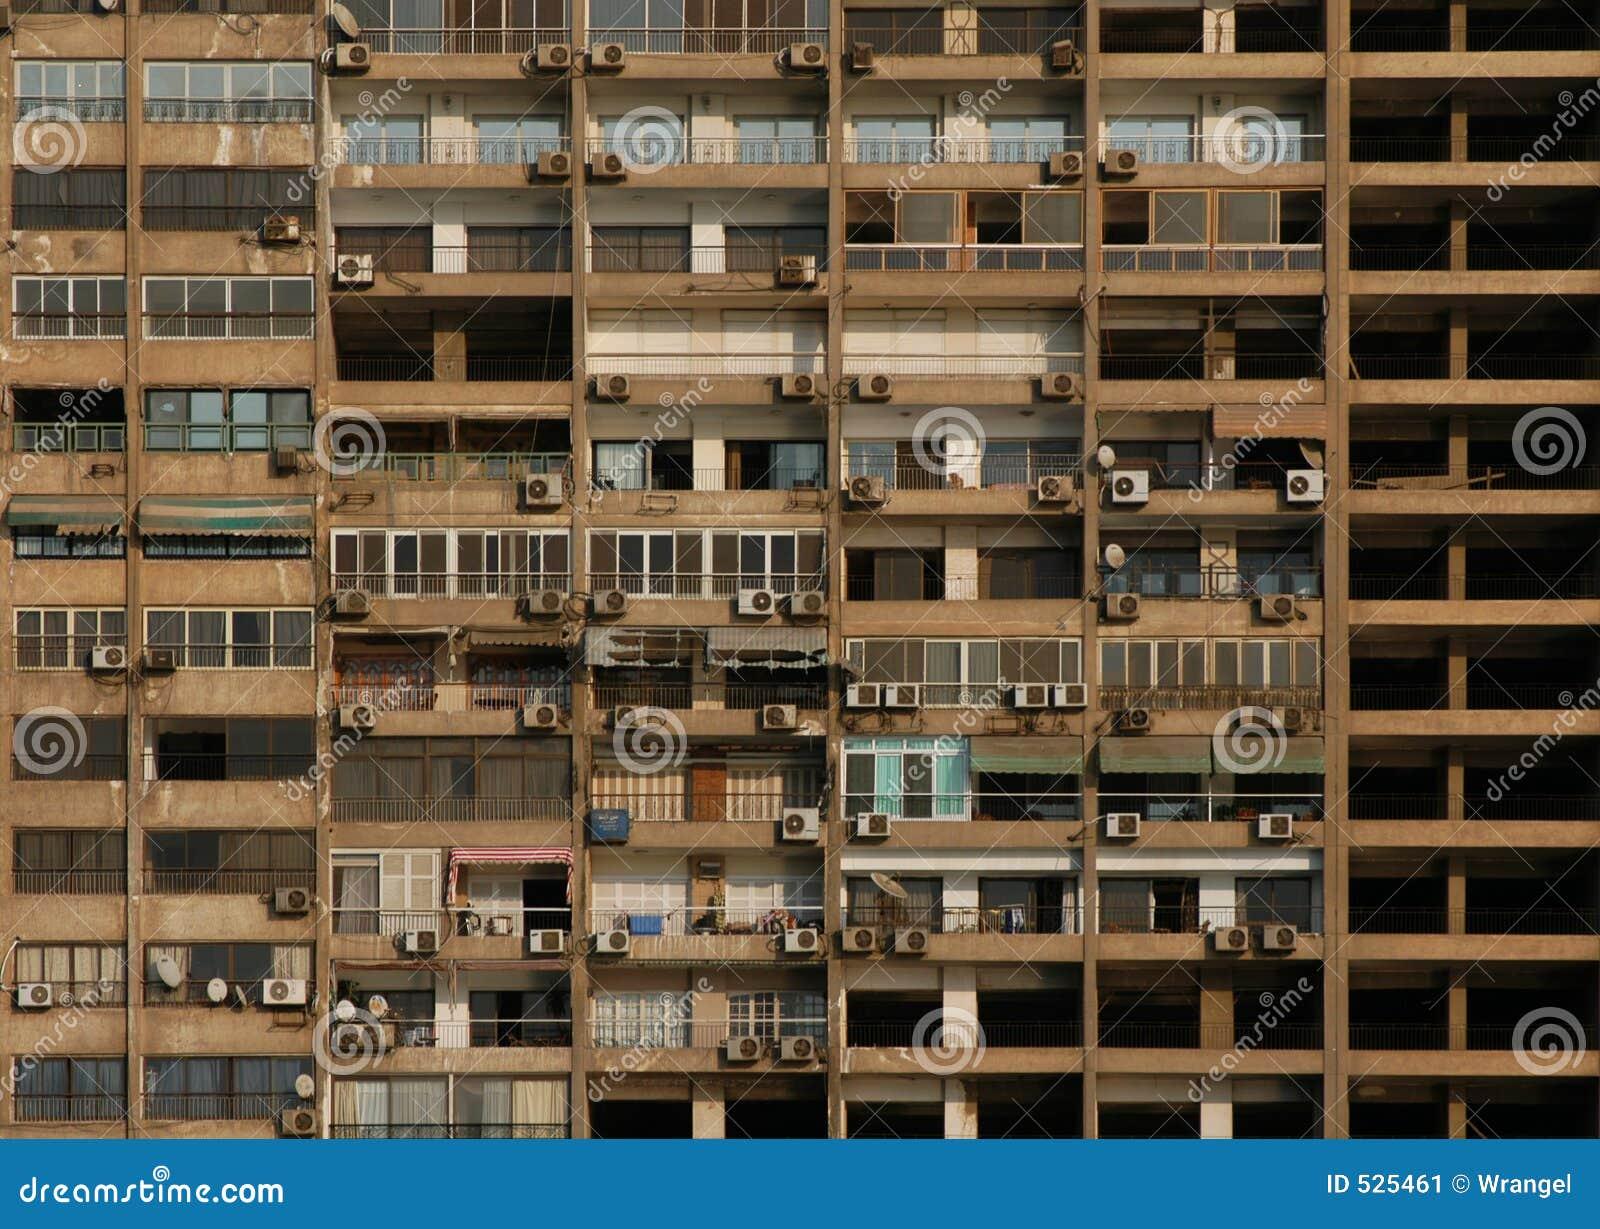 Download 详述门廊摩天大楼视窗 库存图片. 图片 包括有 视窗, 建筑, 现代, 航空, 城市规划, 实现, 玻璃, 摩天大楼 - 525461